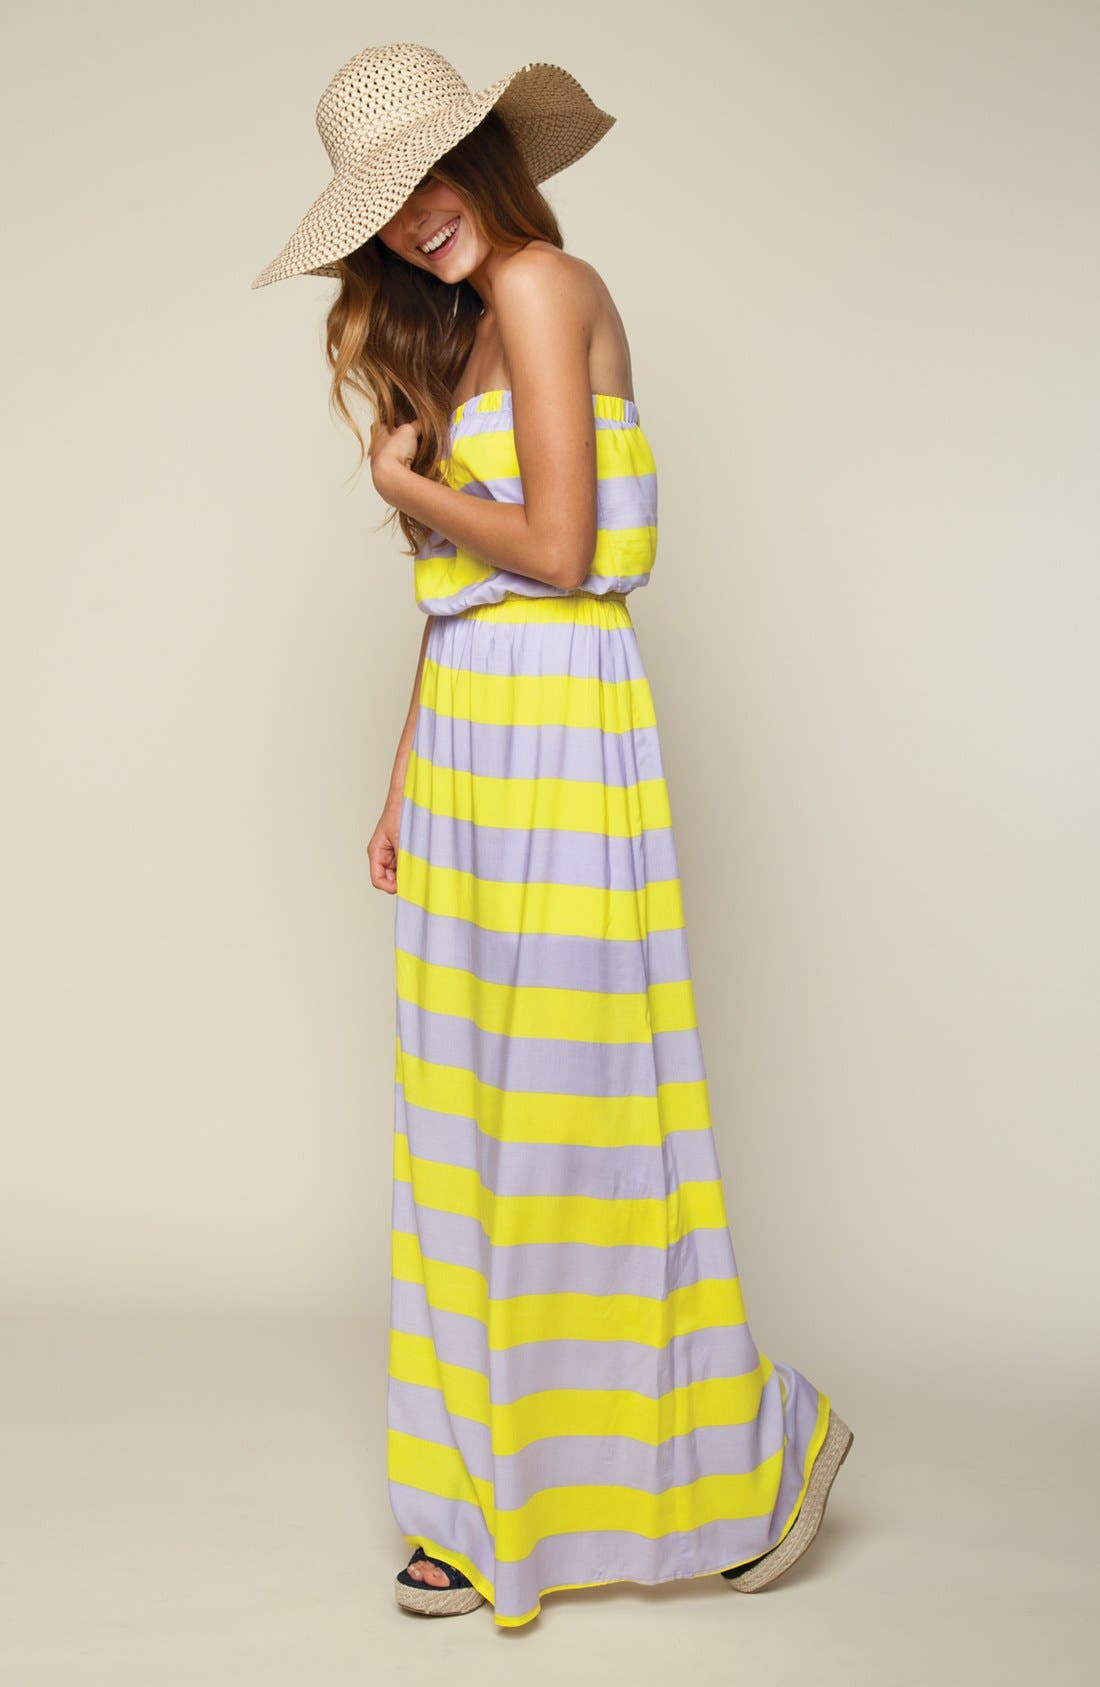 Alternate Image 1 Selected - Splendid Stripe Maxi Dress & Accessories